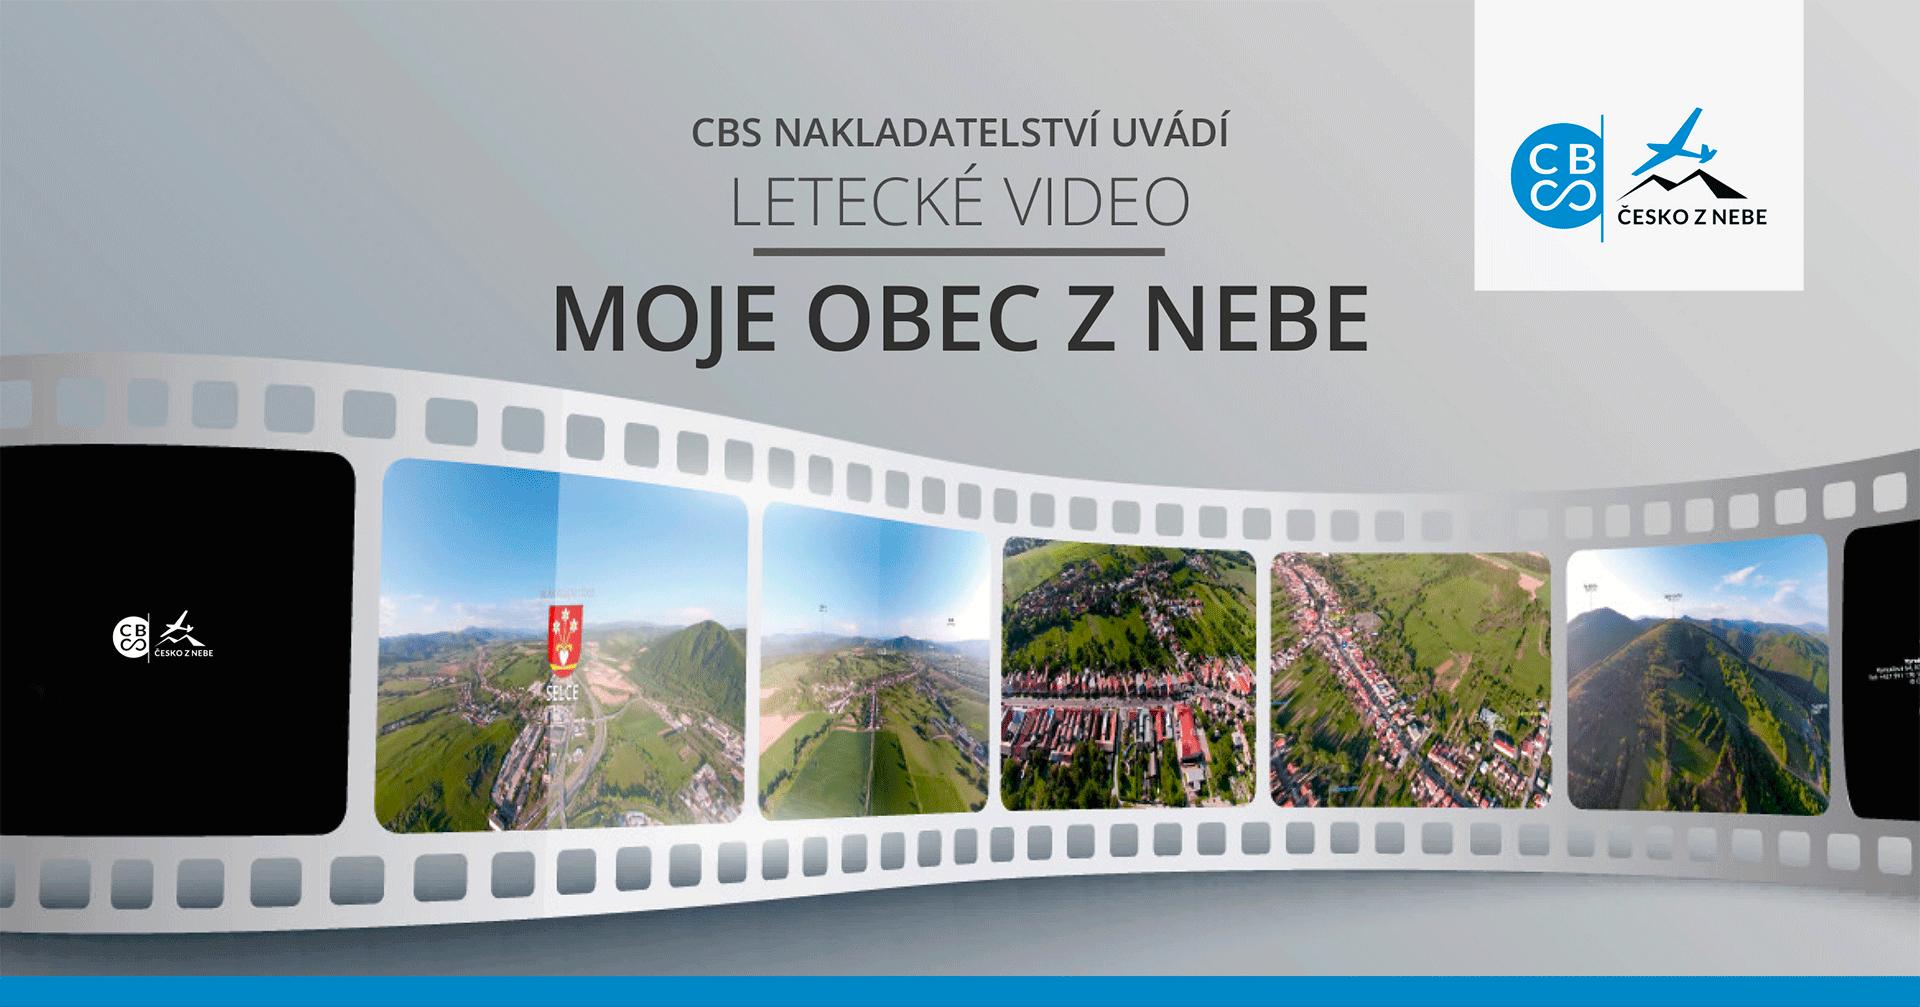 Letecké video